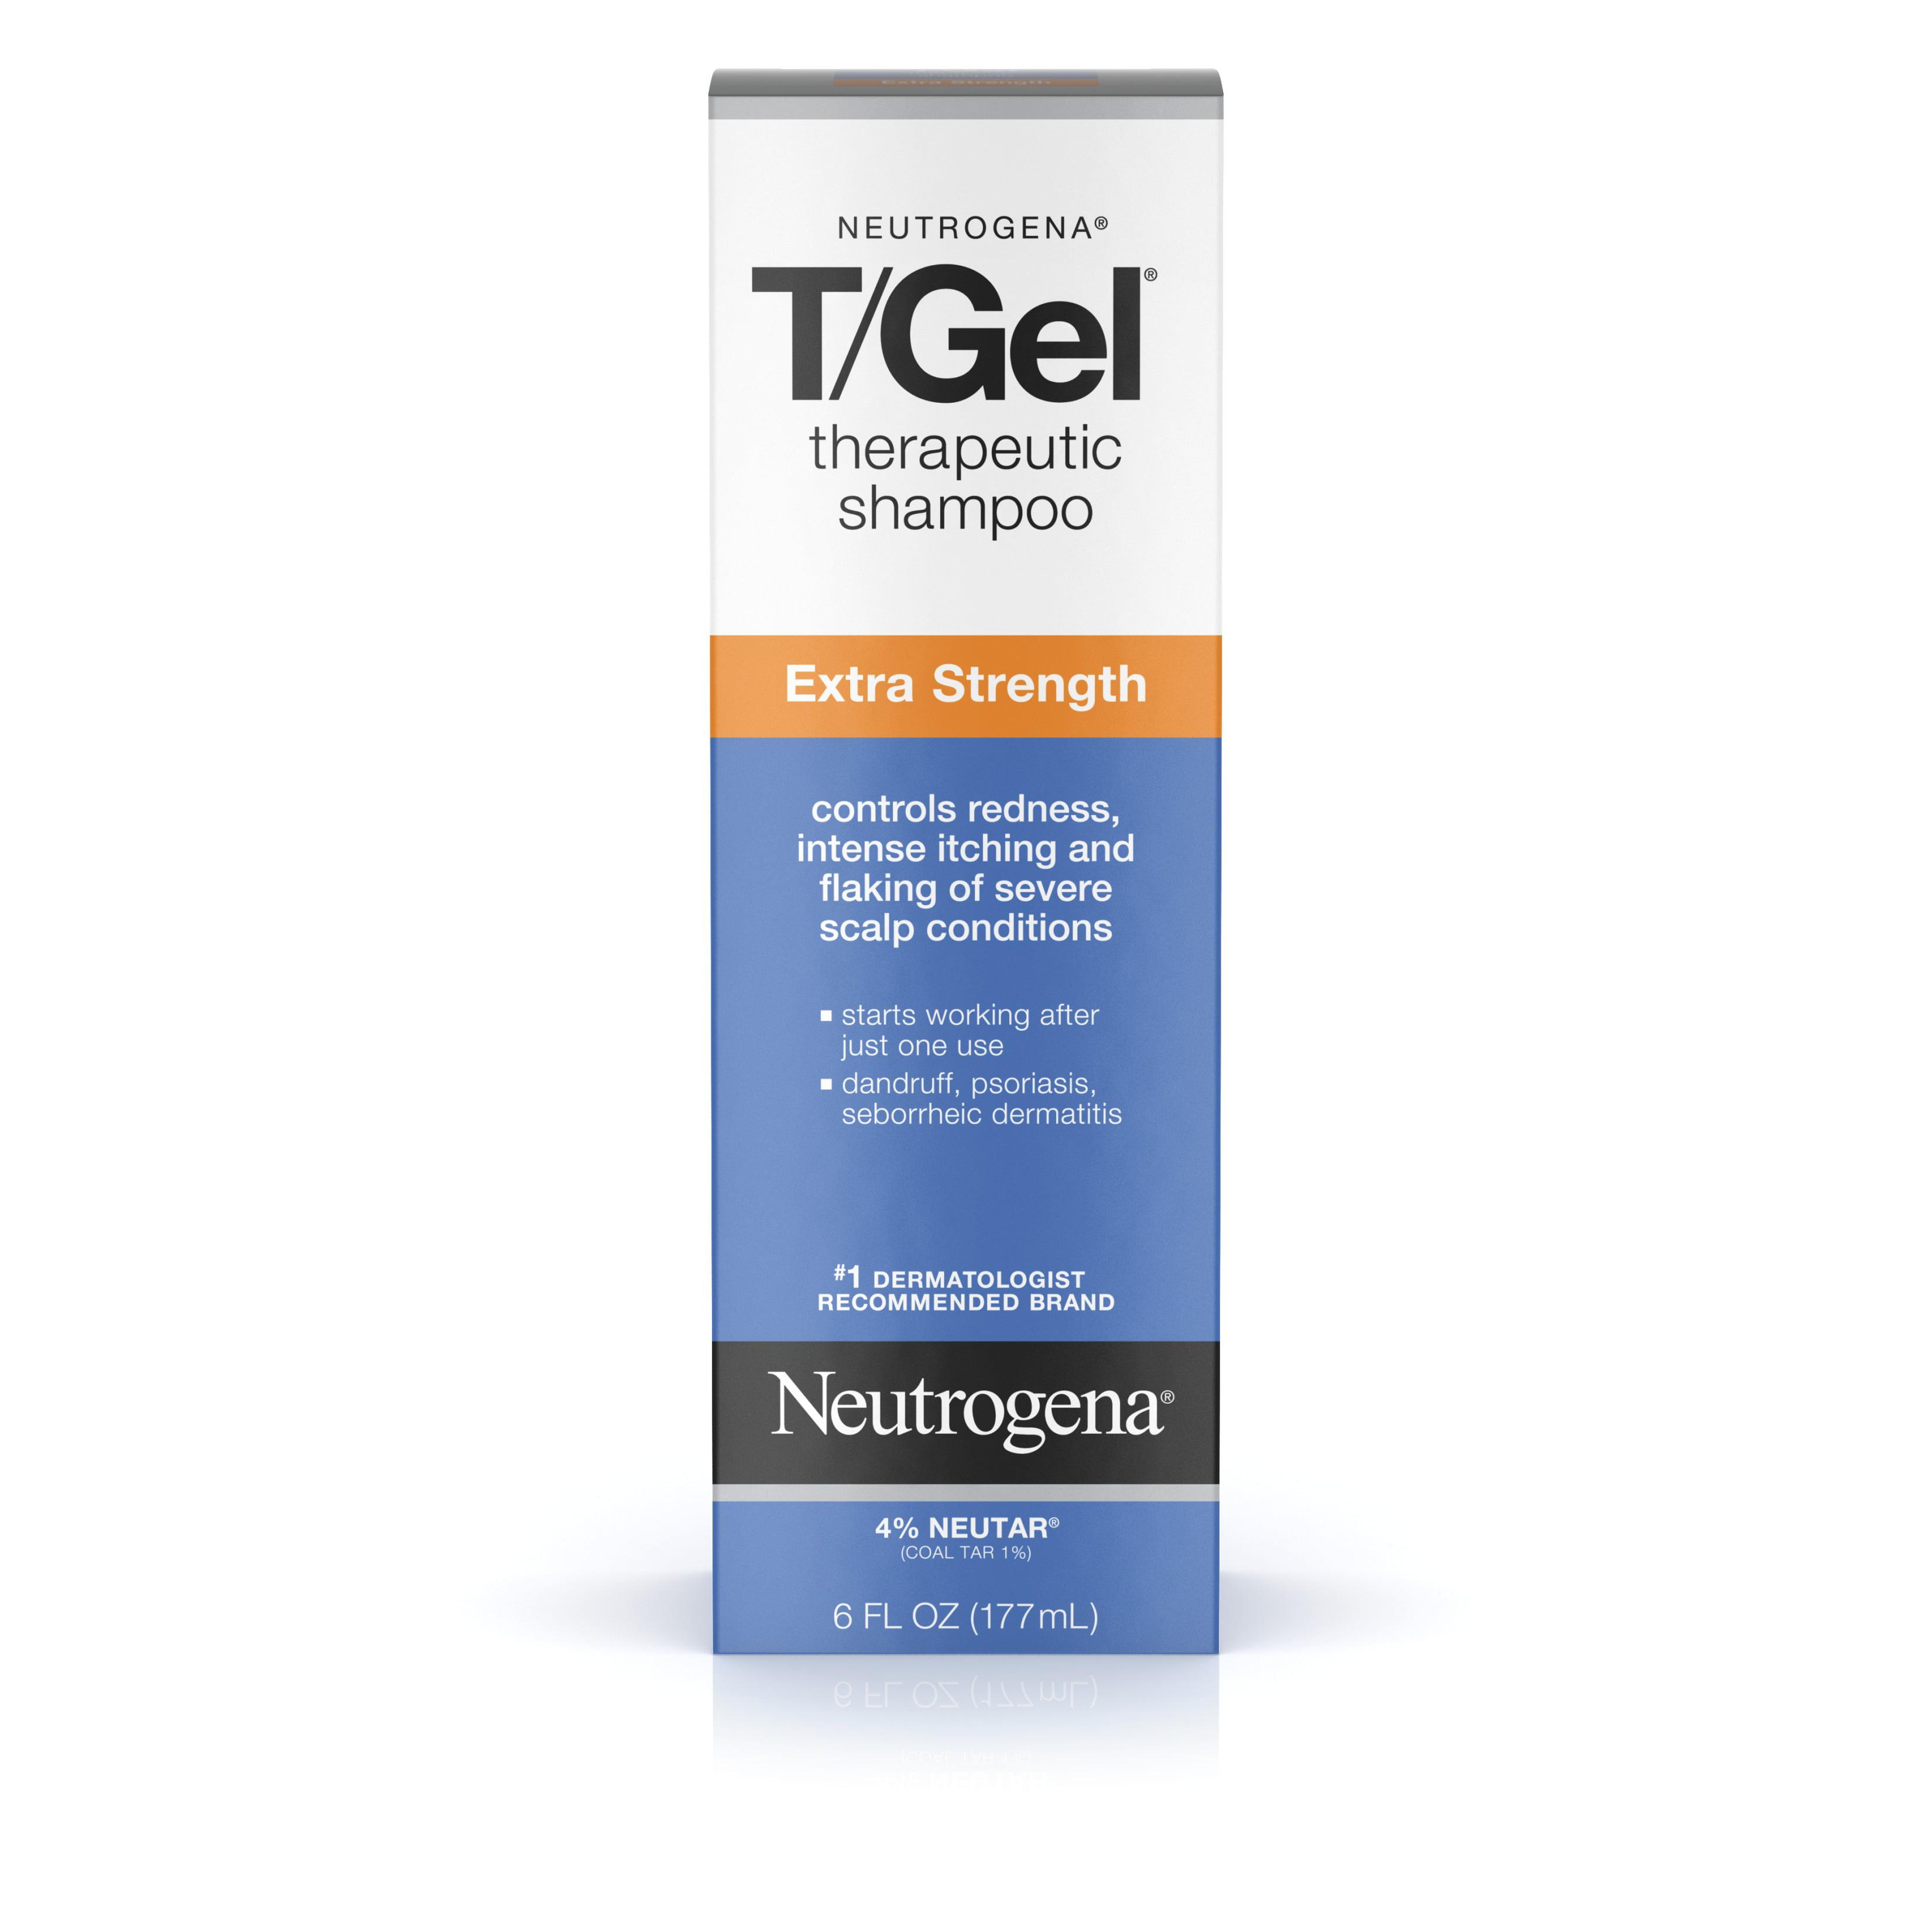 Neutrogena T/Gel Extra Strength Therapeutic Shampoo, 6 Oz - Walmart.com